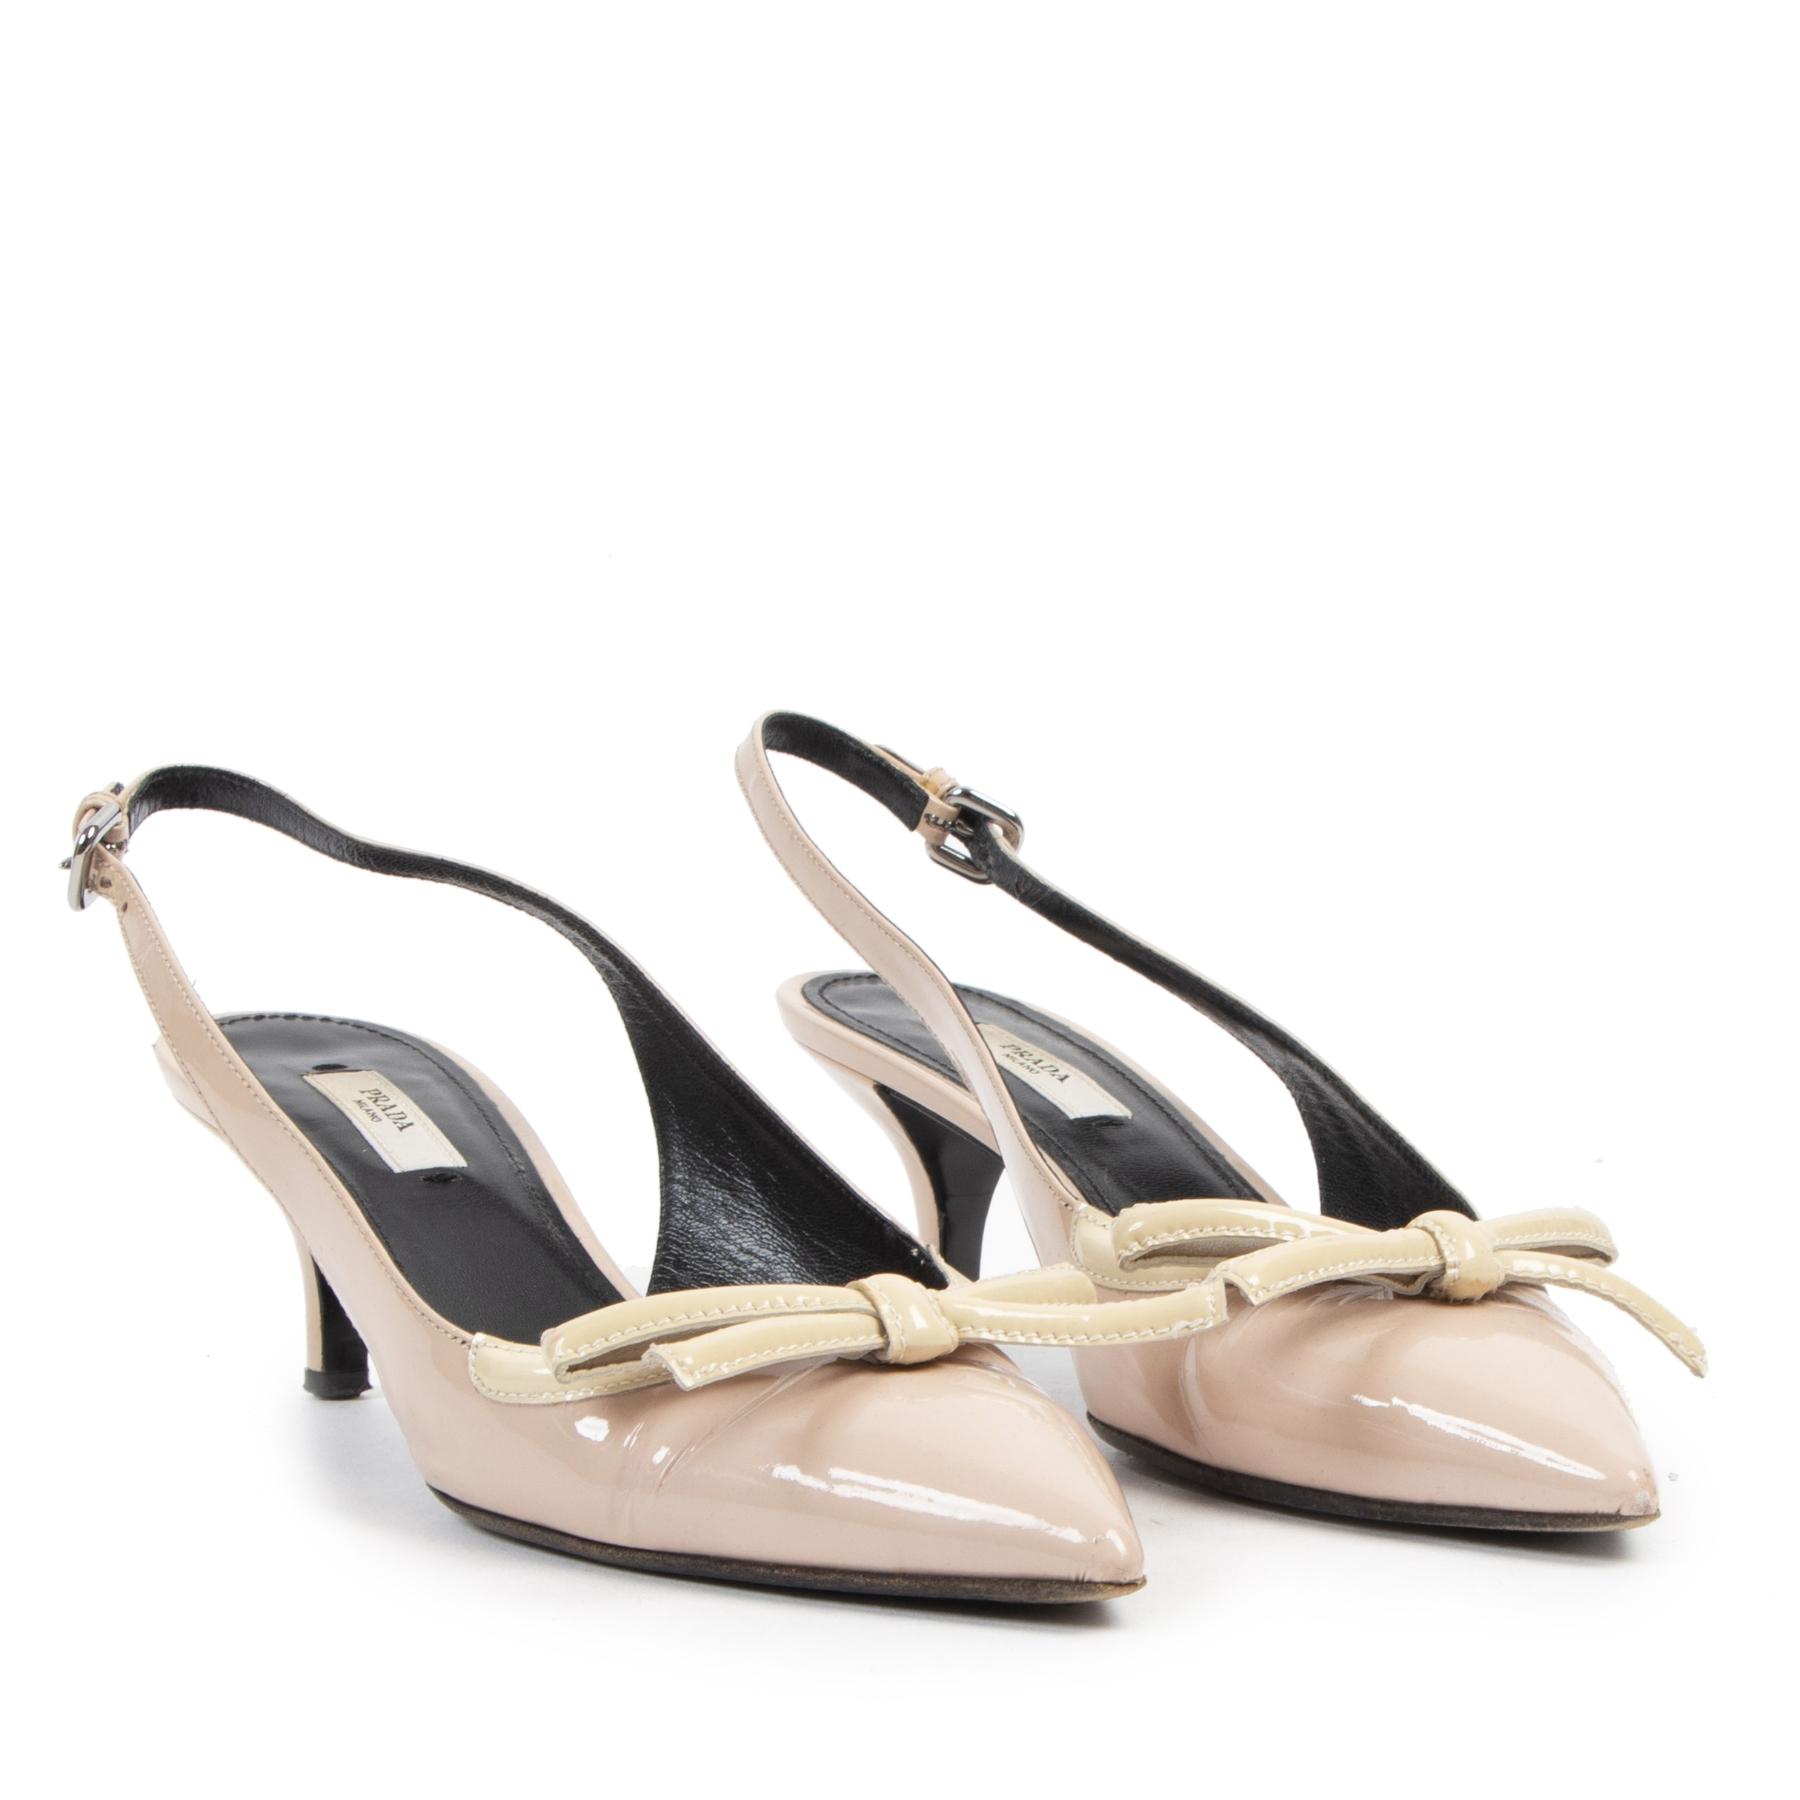 Authentic secondhand Prada Nude Leather Strap Kitten Heels - Size 37,5 designer bags fashion luxury vintage webshop